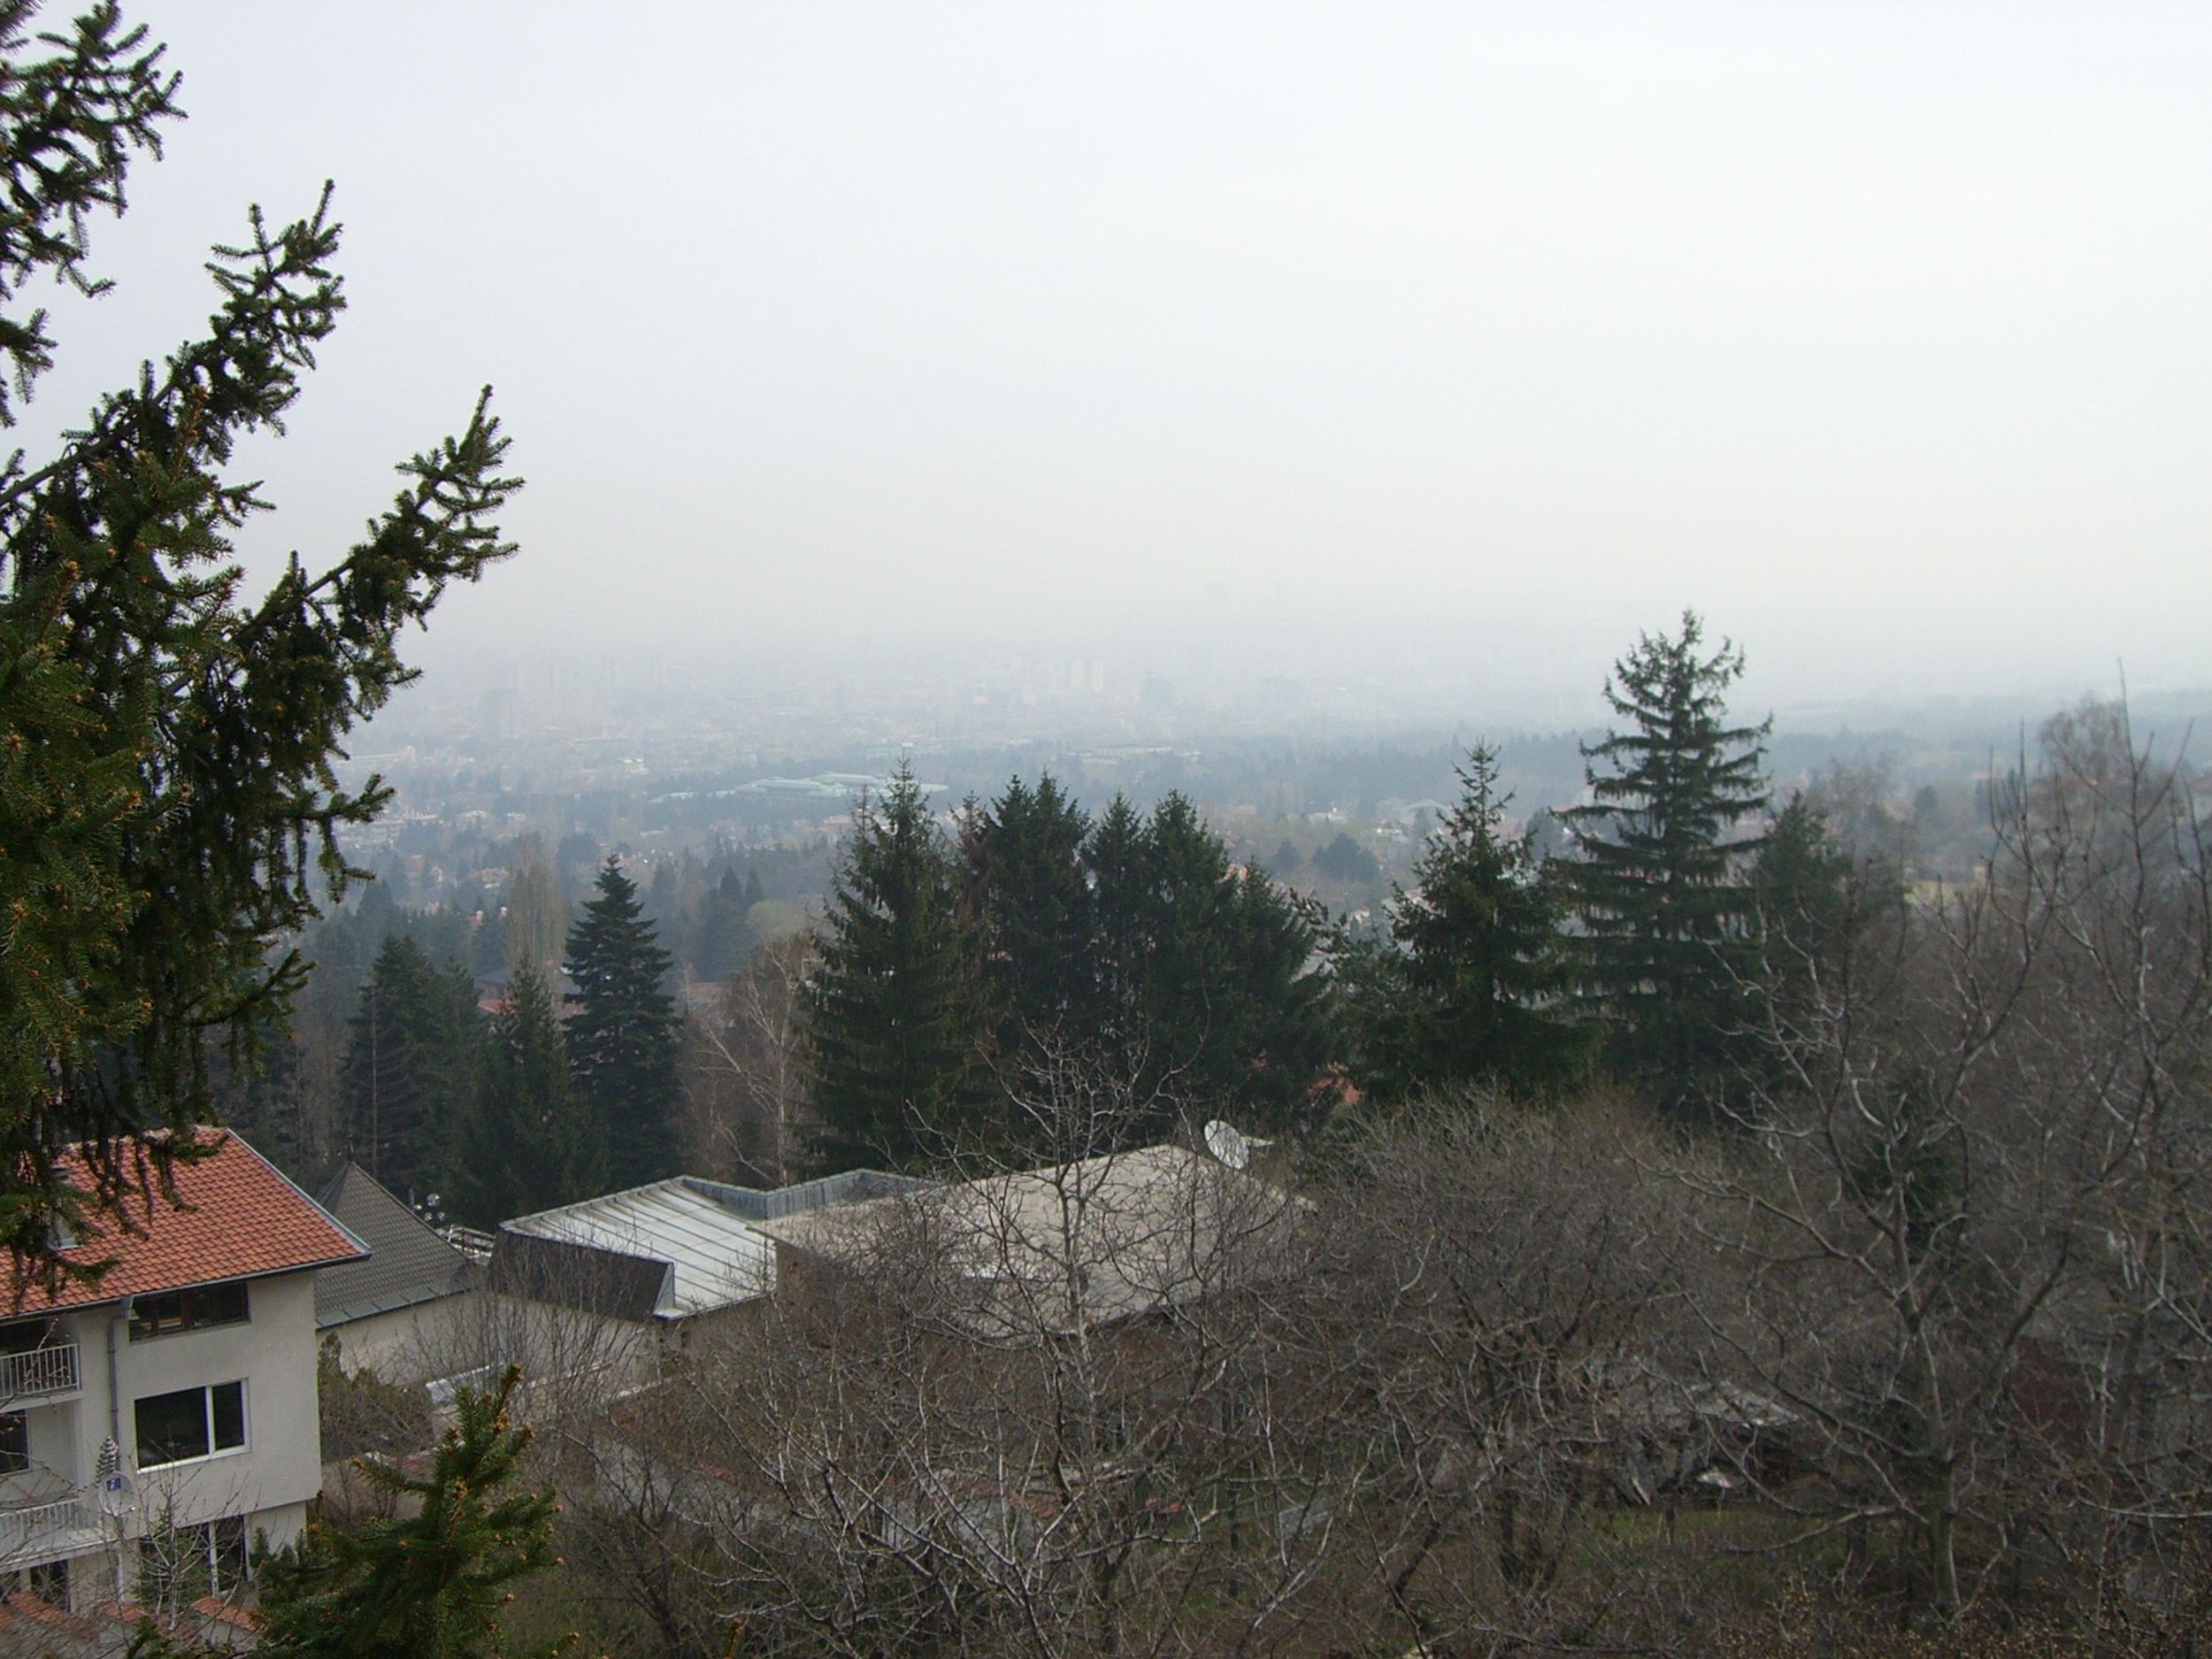 Sofia, Bulgaria by Gillham